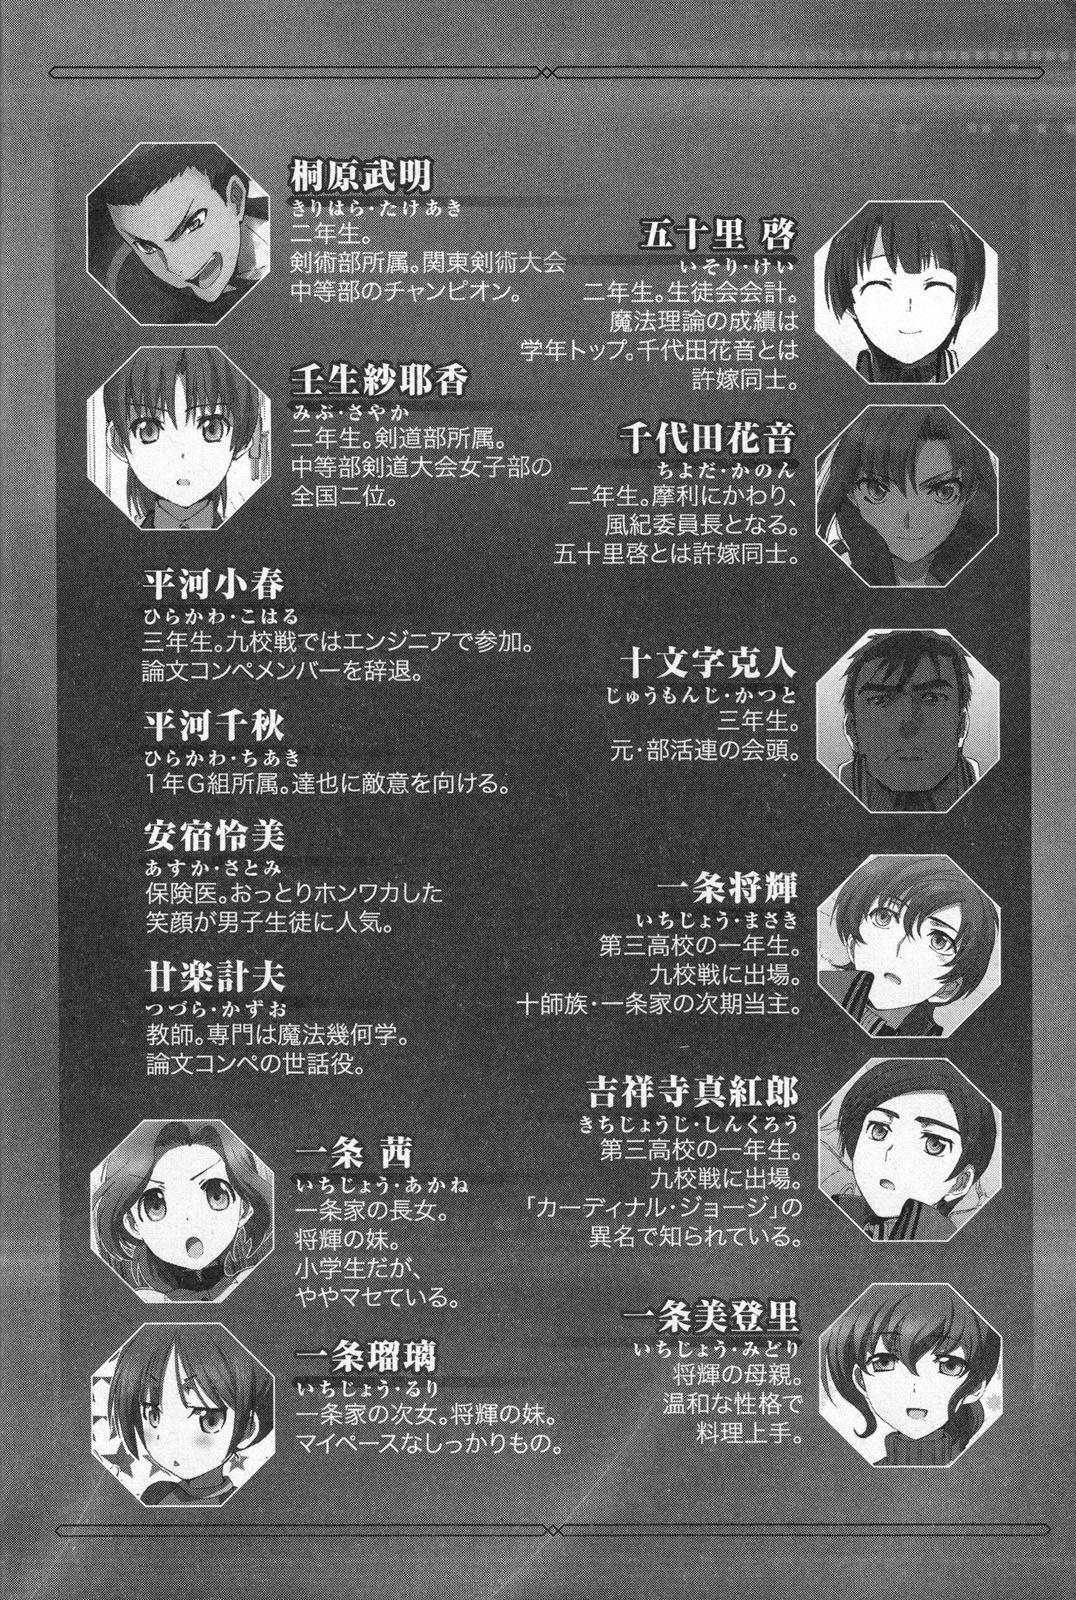 monogatari series light novel pdf download